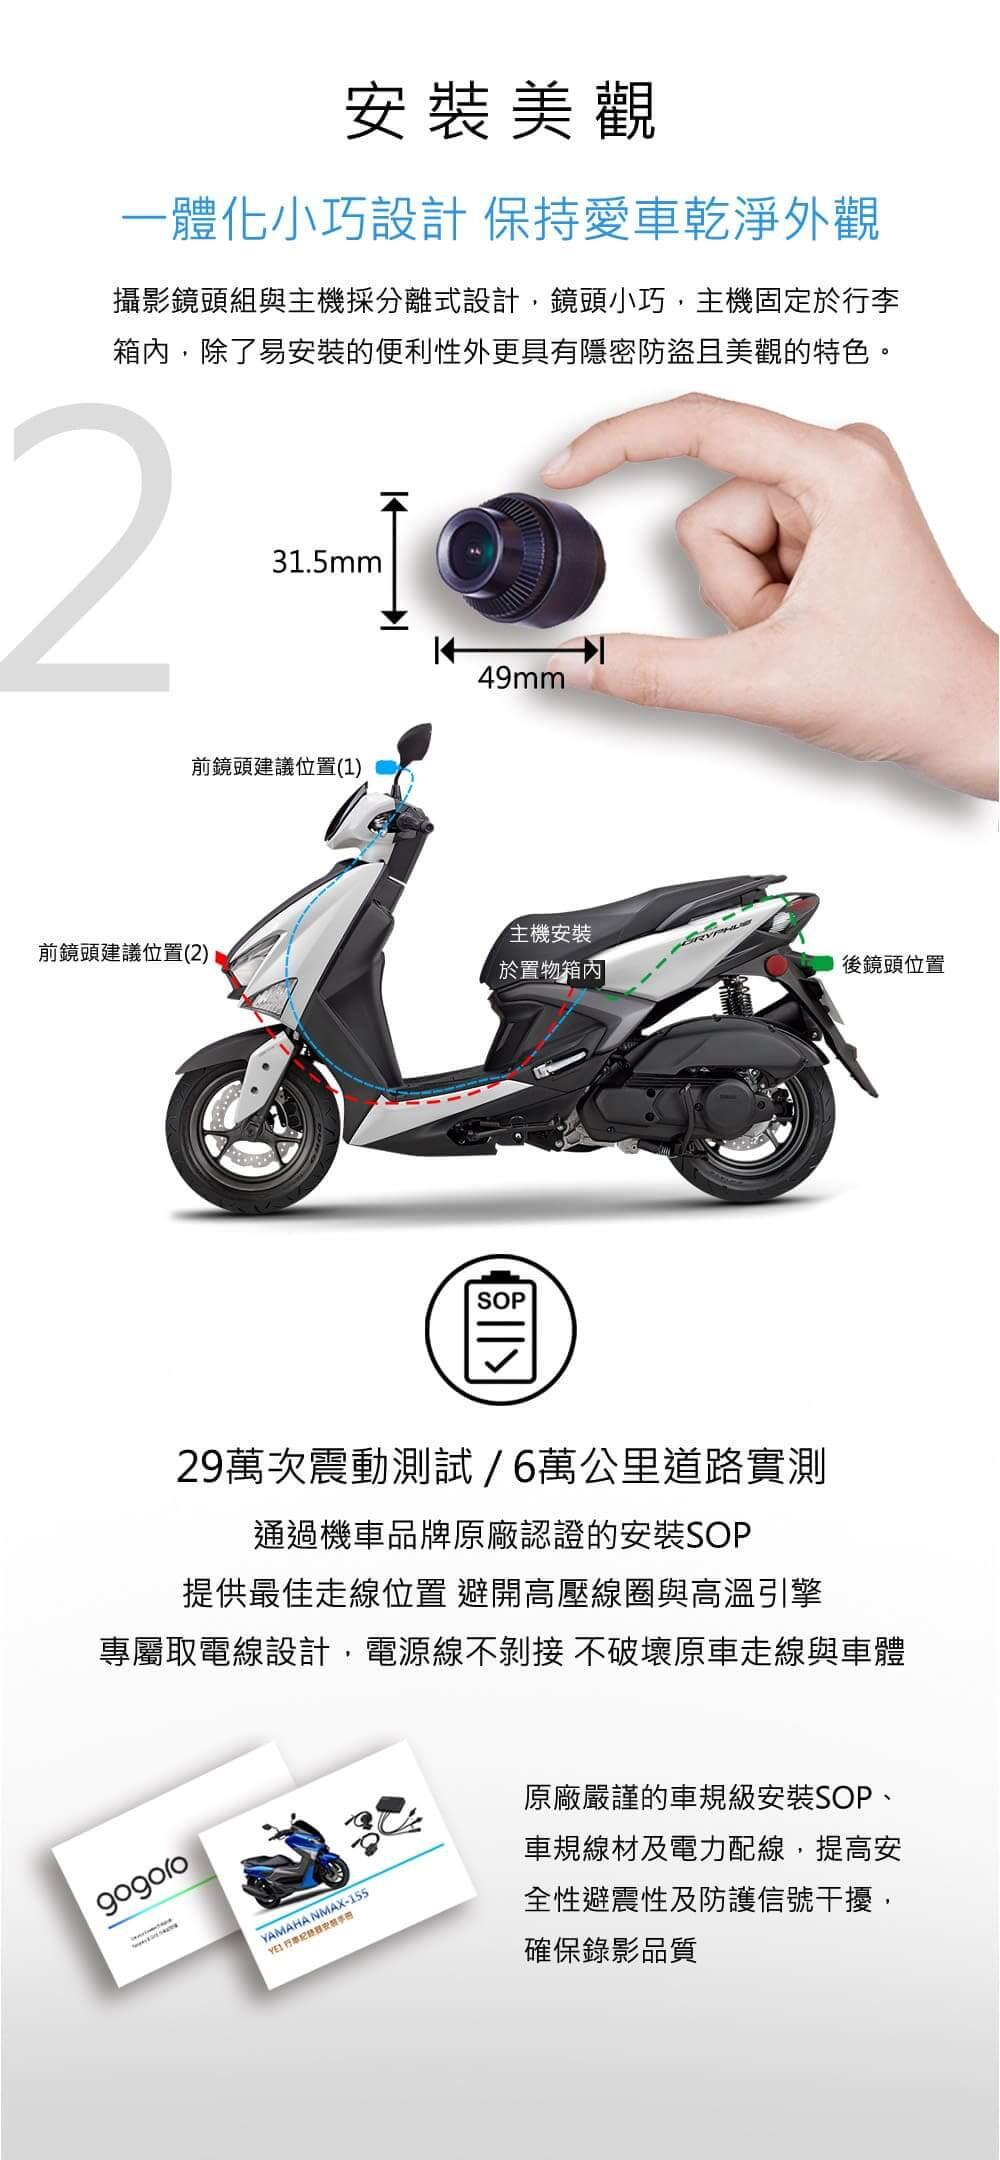 proimages/product/Bike_Cam/GX3HR-A/06.jpg